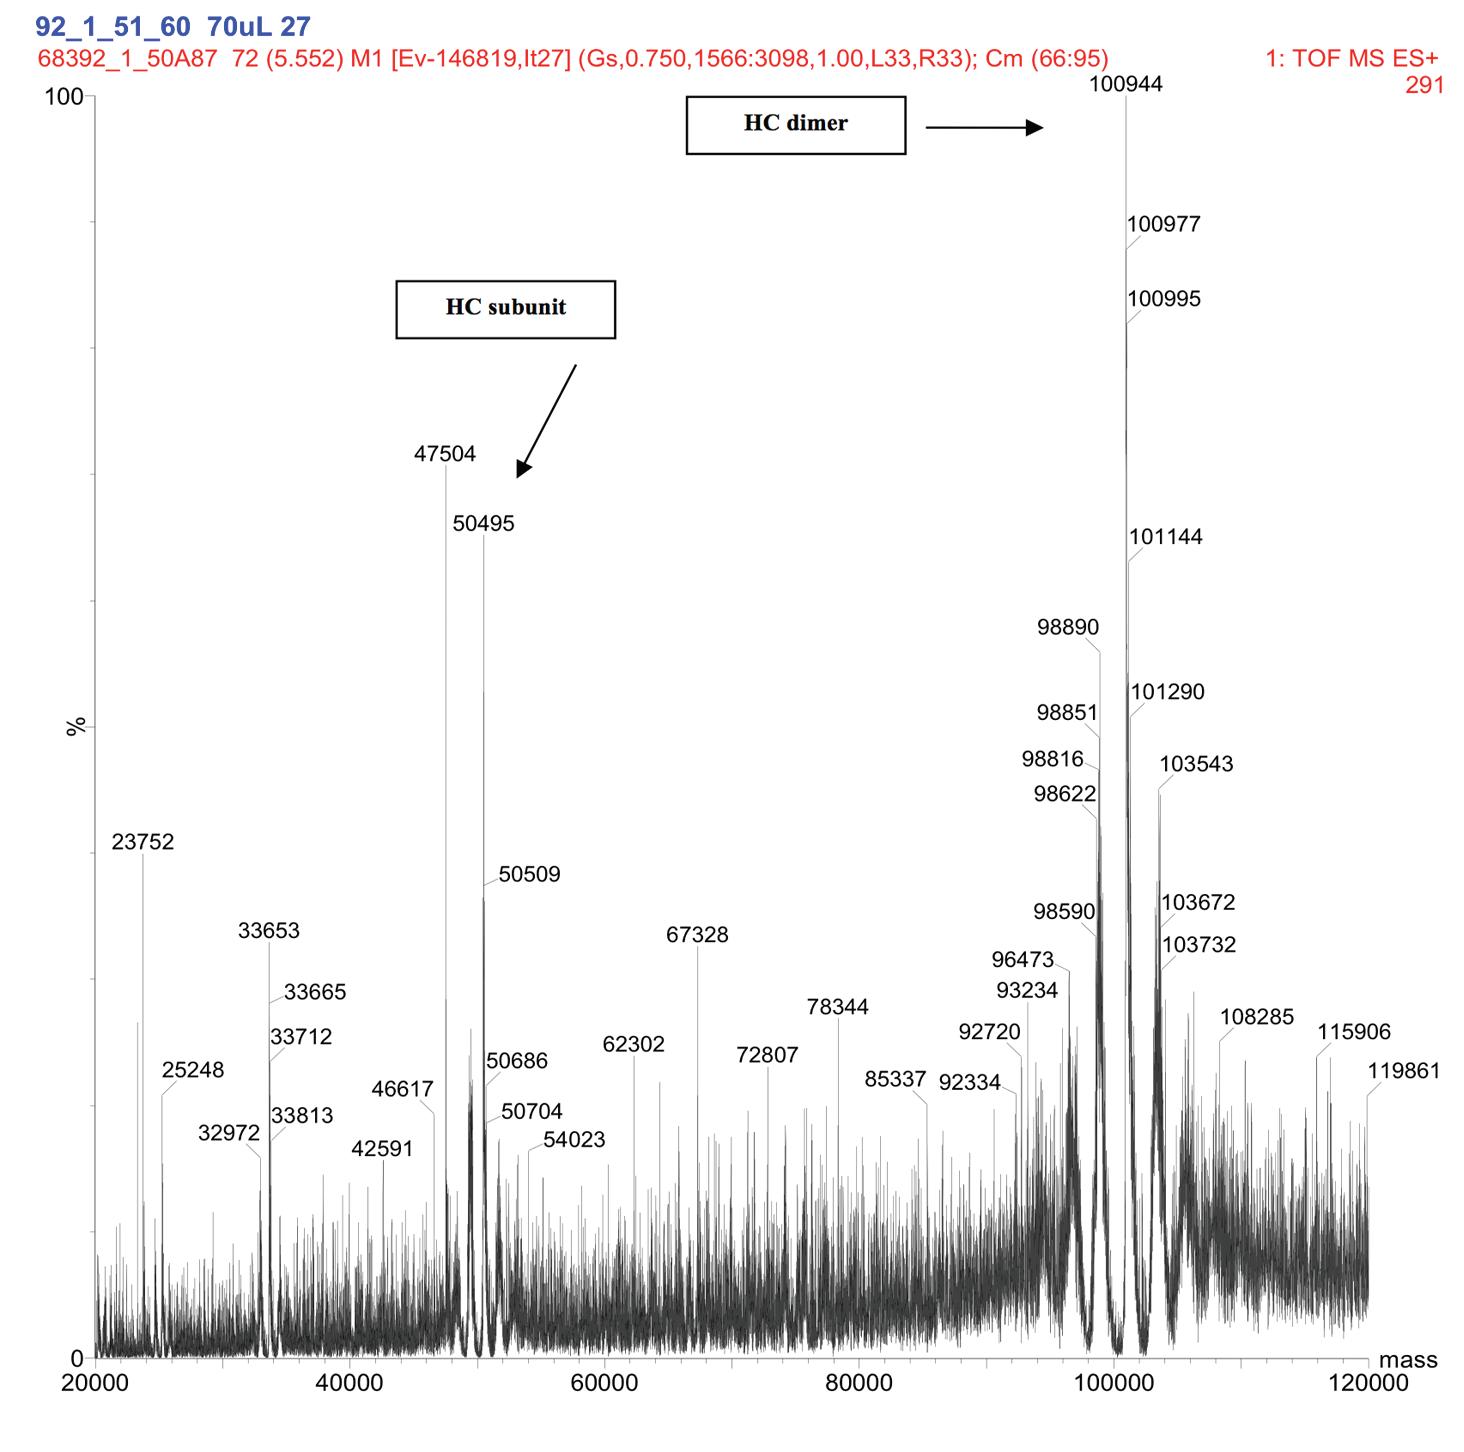 Figure 11. Representative Deconvoluted Mass Spectra of De3 at ~pk 60 min